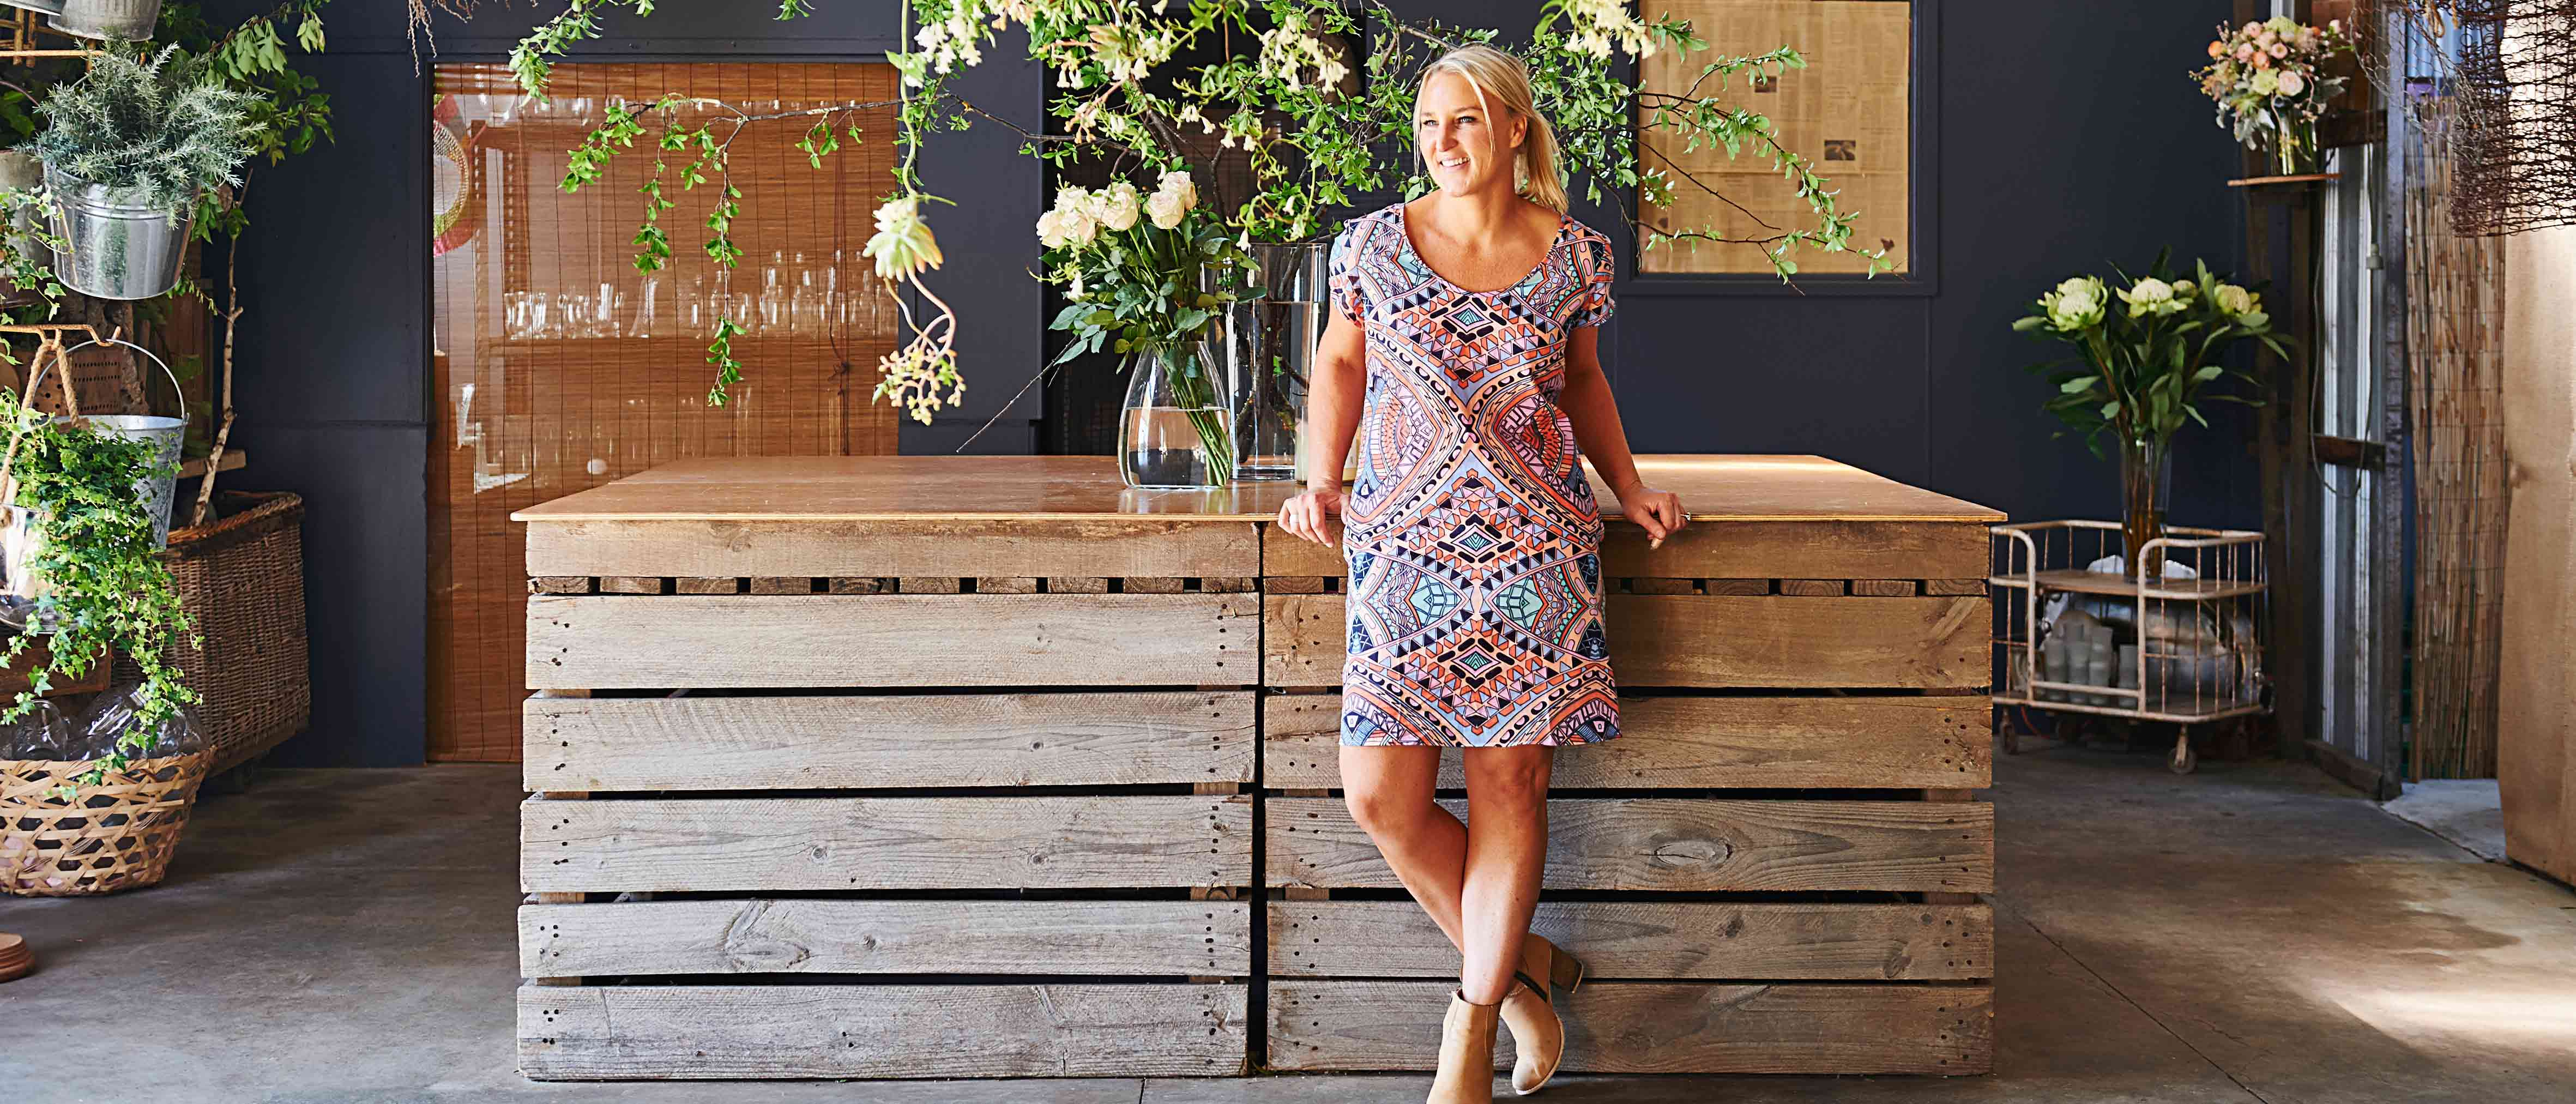 Life As  A Florist With Danielle Fraser